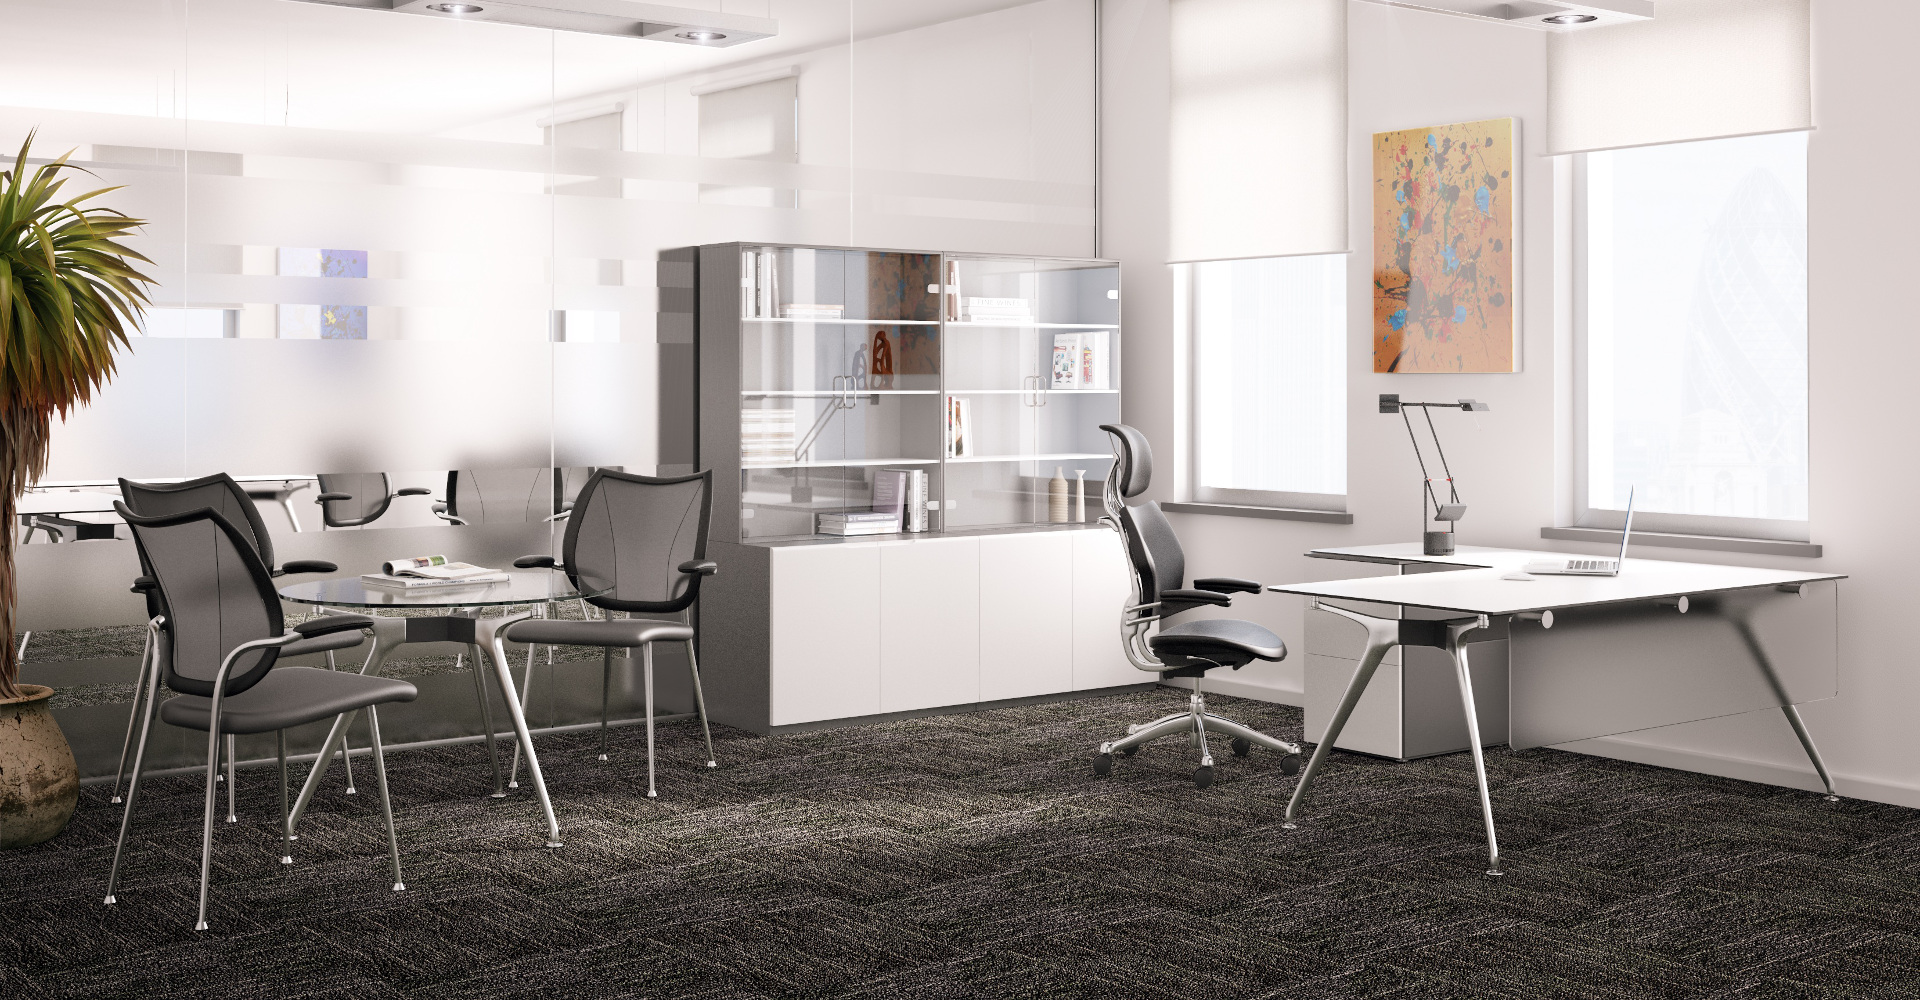 Klein kantoor inrichten slimme tips van interieur for Interieur stylisten